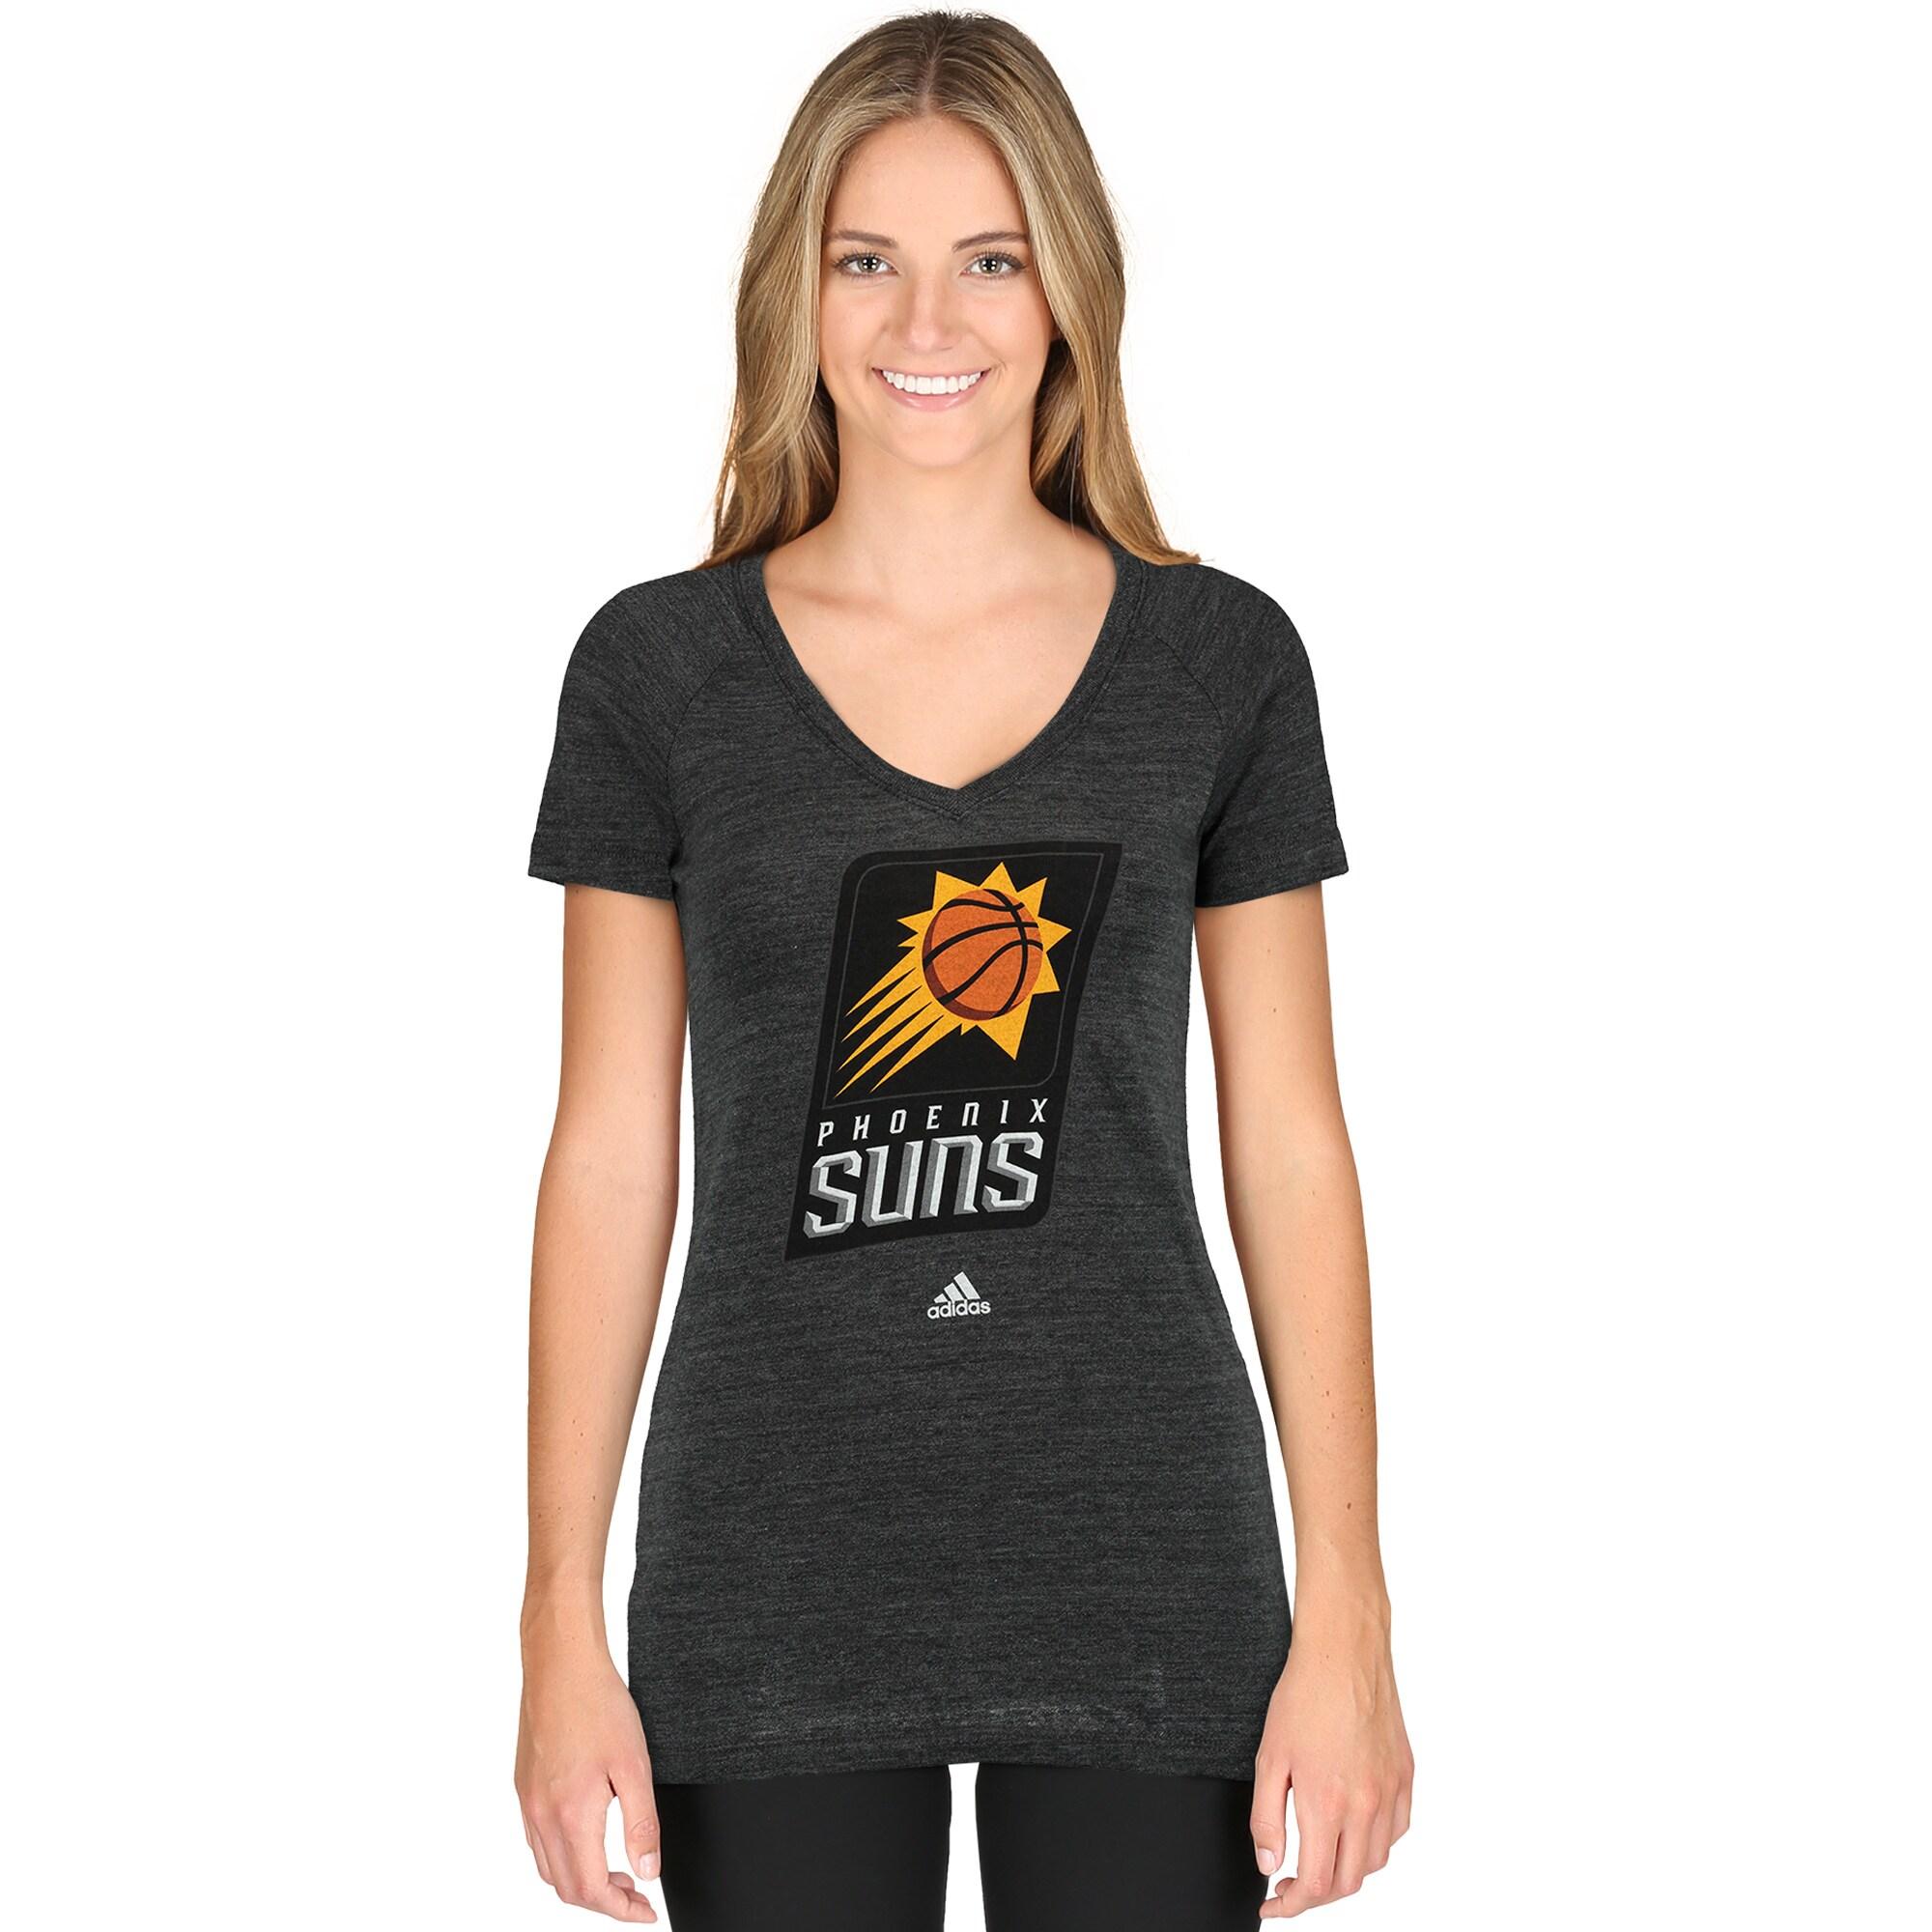 Phoenix Suns adidas Women's Primary Logo Tri-Blend V-Neck T-Shirt - Black